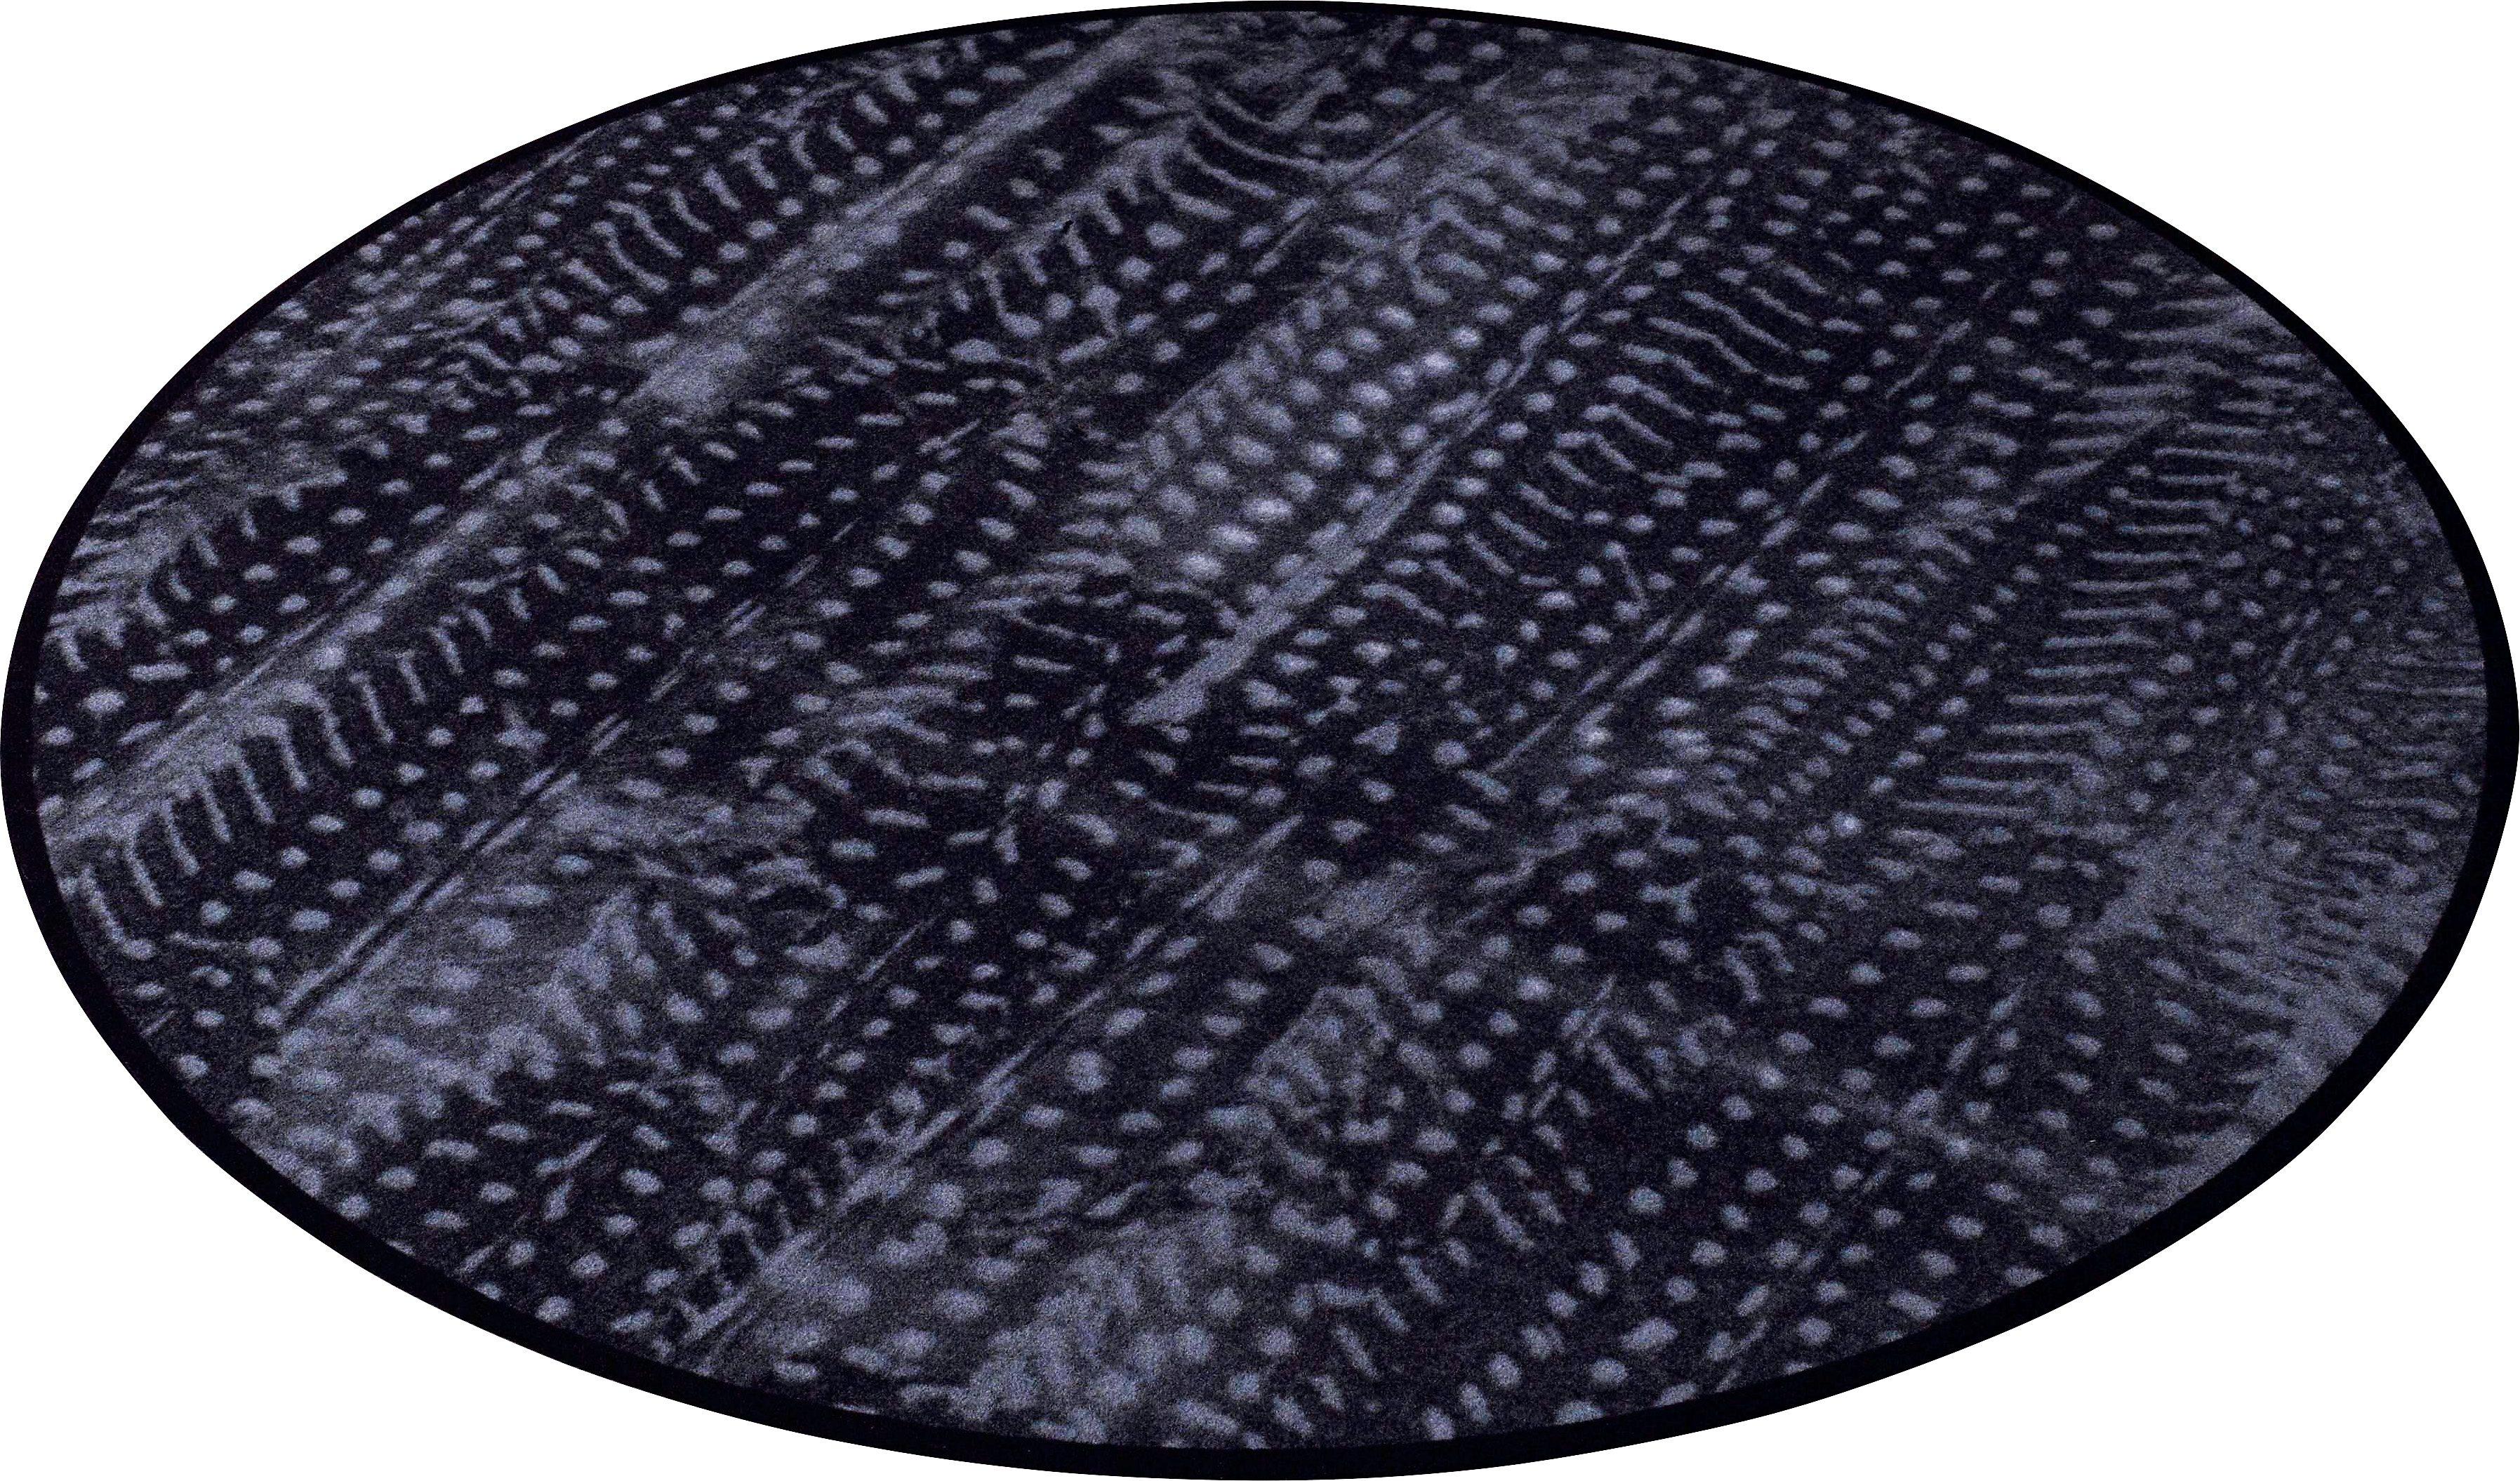 Teppich, Zala Living, »Animal Print Feder« in Fell-Optik, rund